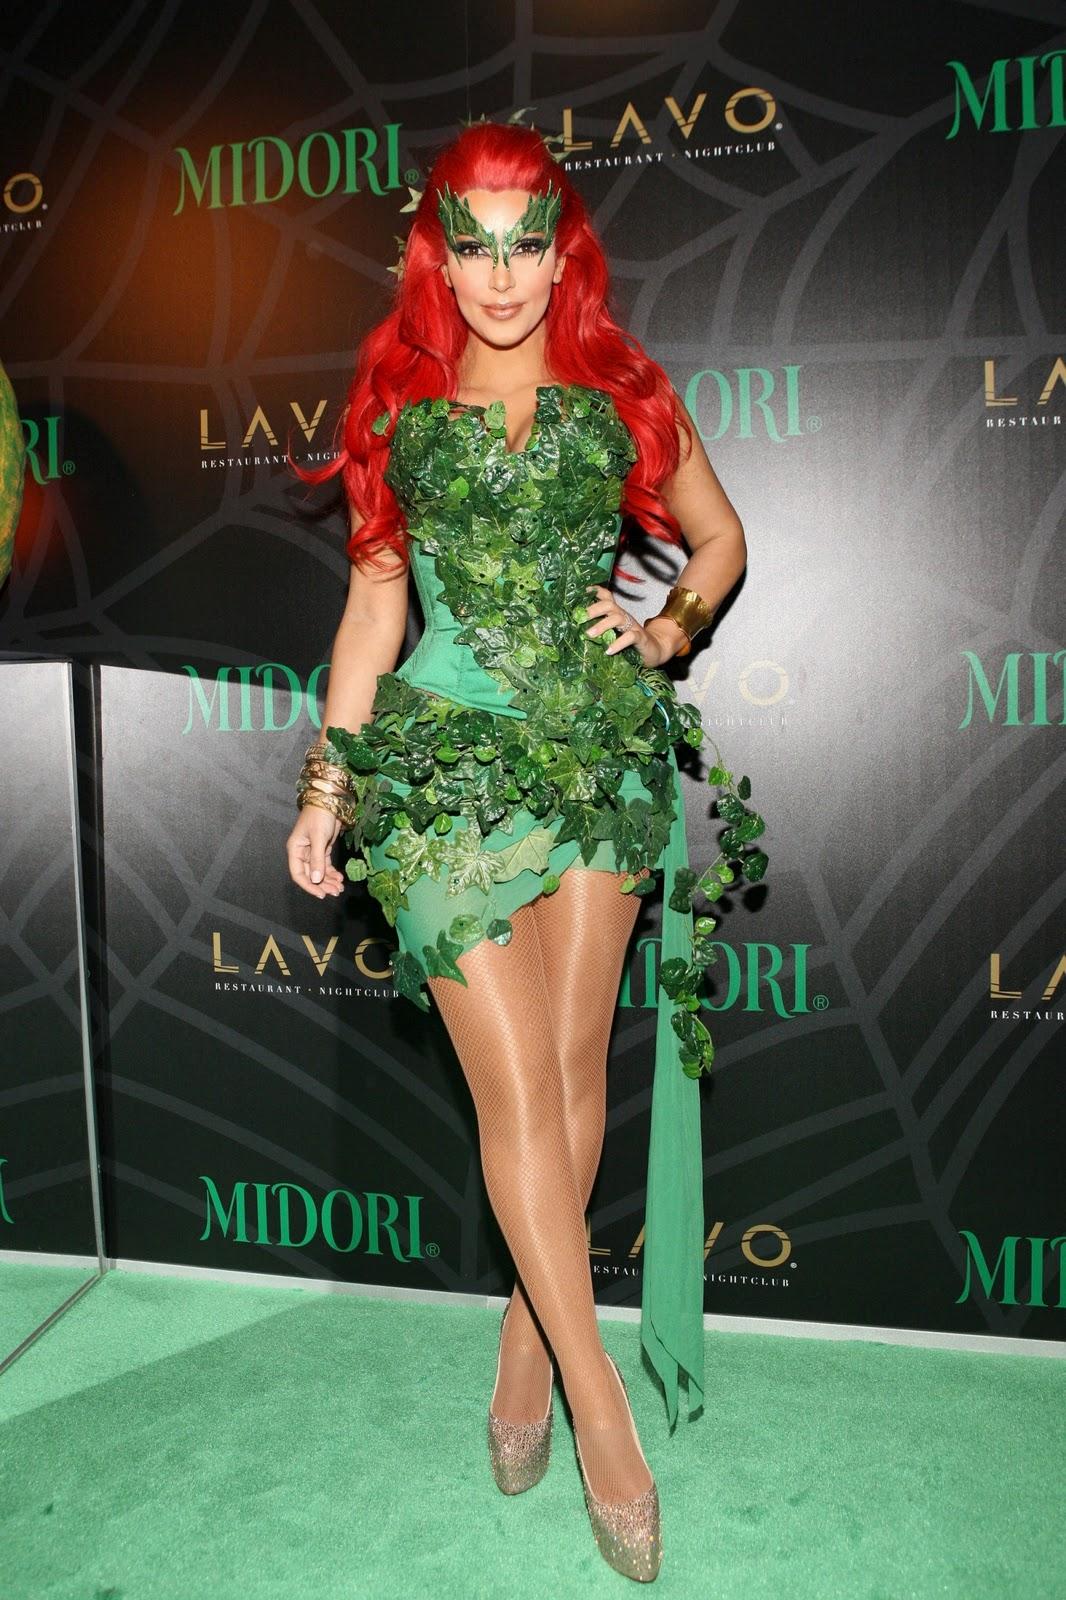 http://1.bp.blogspot.com/-RyvyaVGxX2A/Tq1ARJEd0nI/AAAAAAAABFg/BHZZYFSUNec/s1600/Kim-Kardashian-midori+%25287%2529.jpg